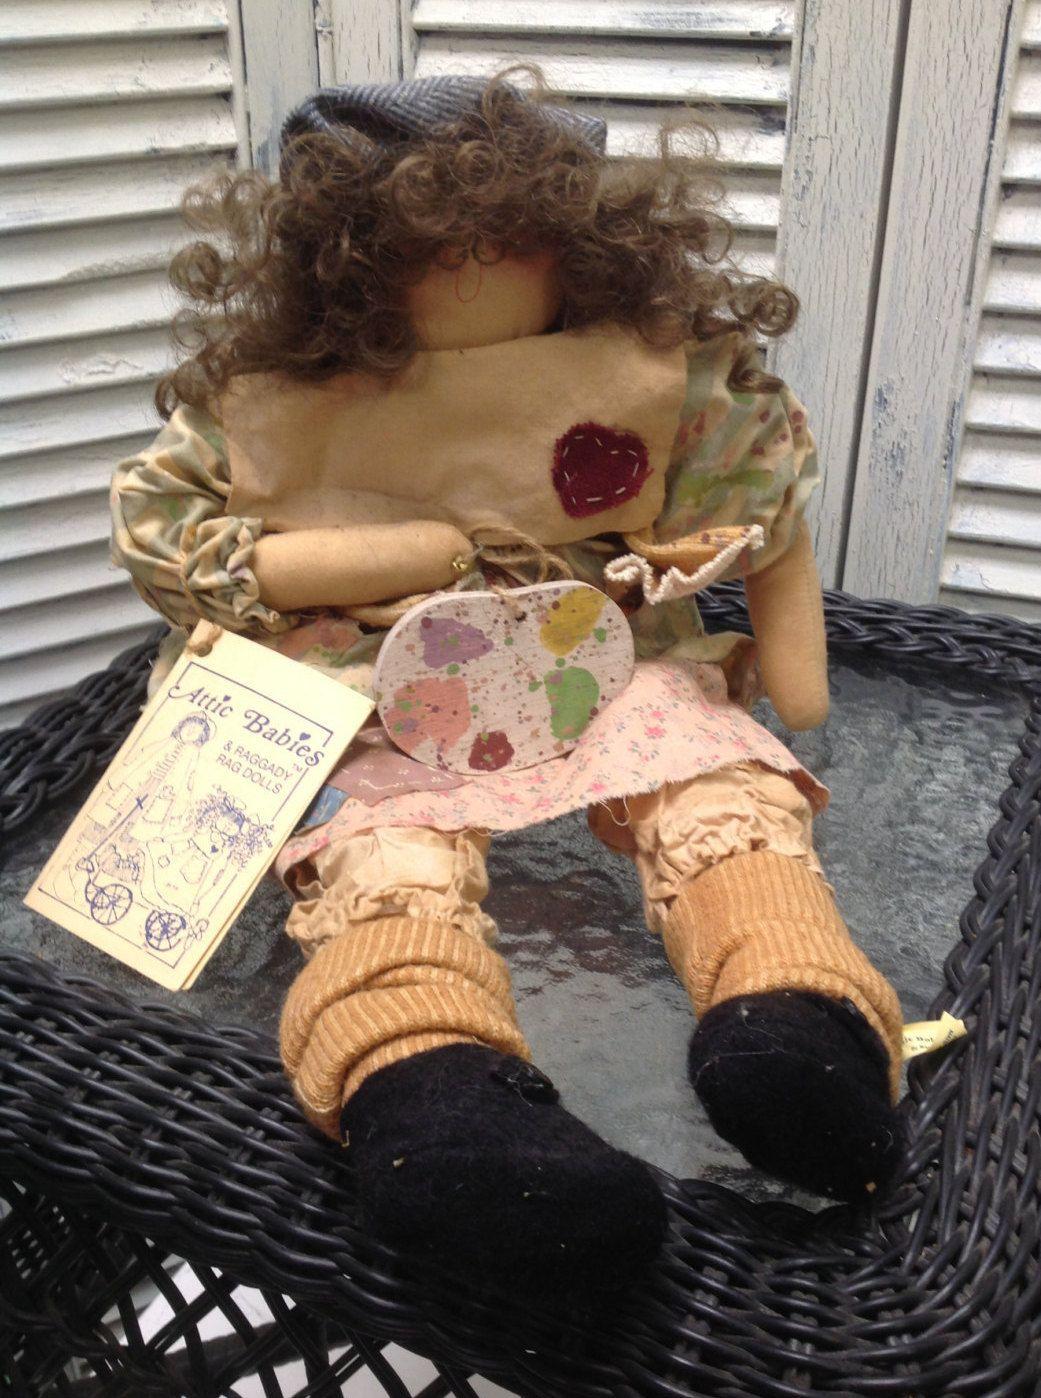 Vintage Attic Babies Dottie Doodles Doll by Marty Maschino by GrandmaRietas onu2026 & Vintage Attic Babies Dottie Doodles Doll by Marty Maschino by ...